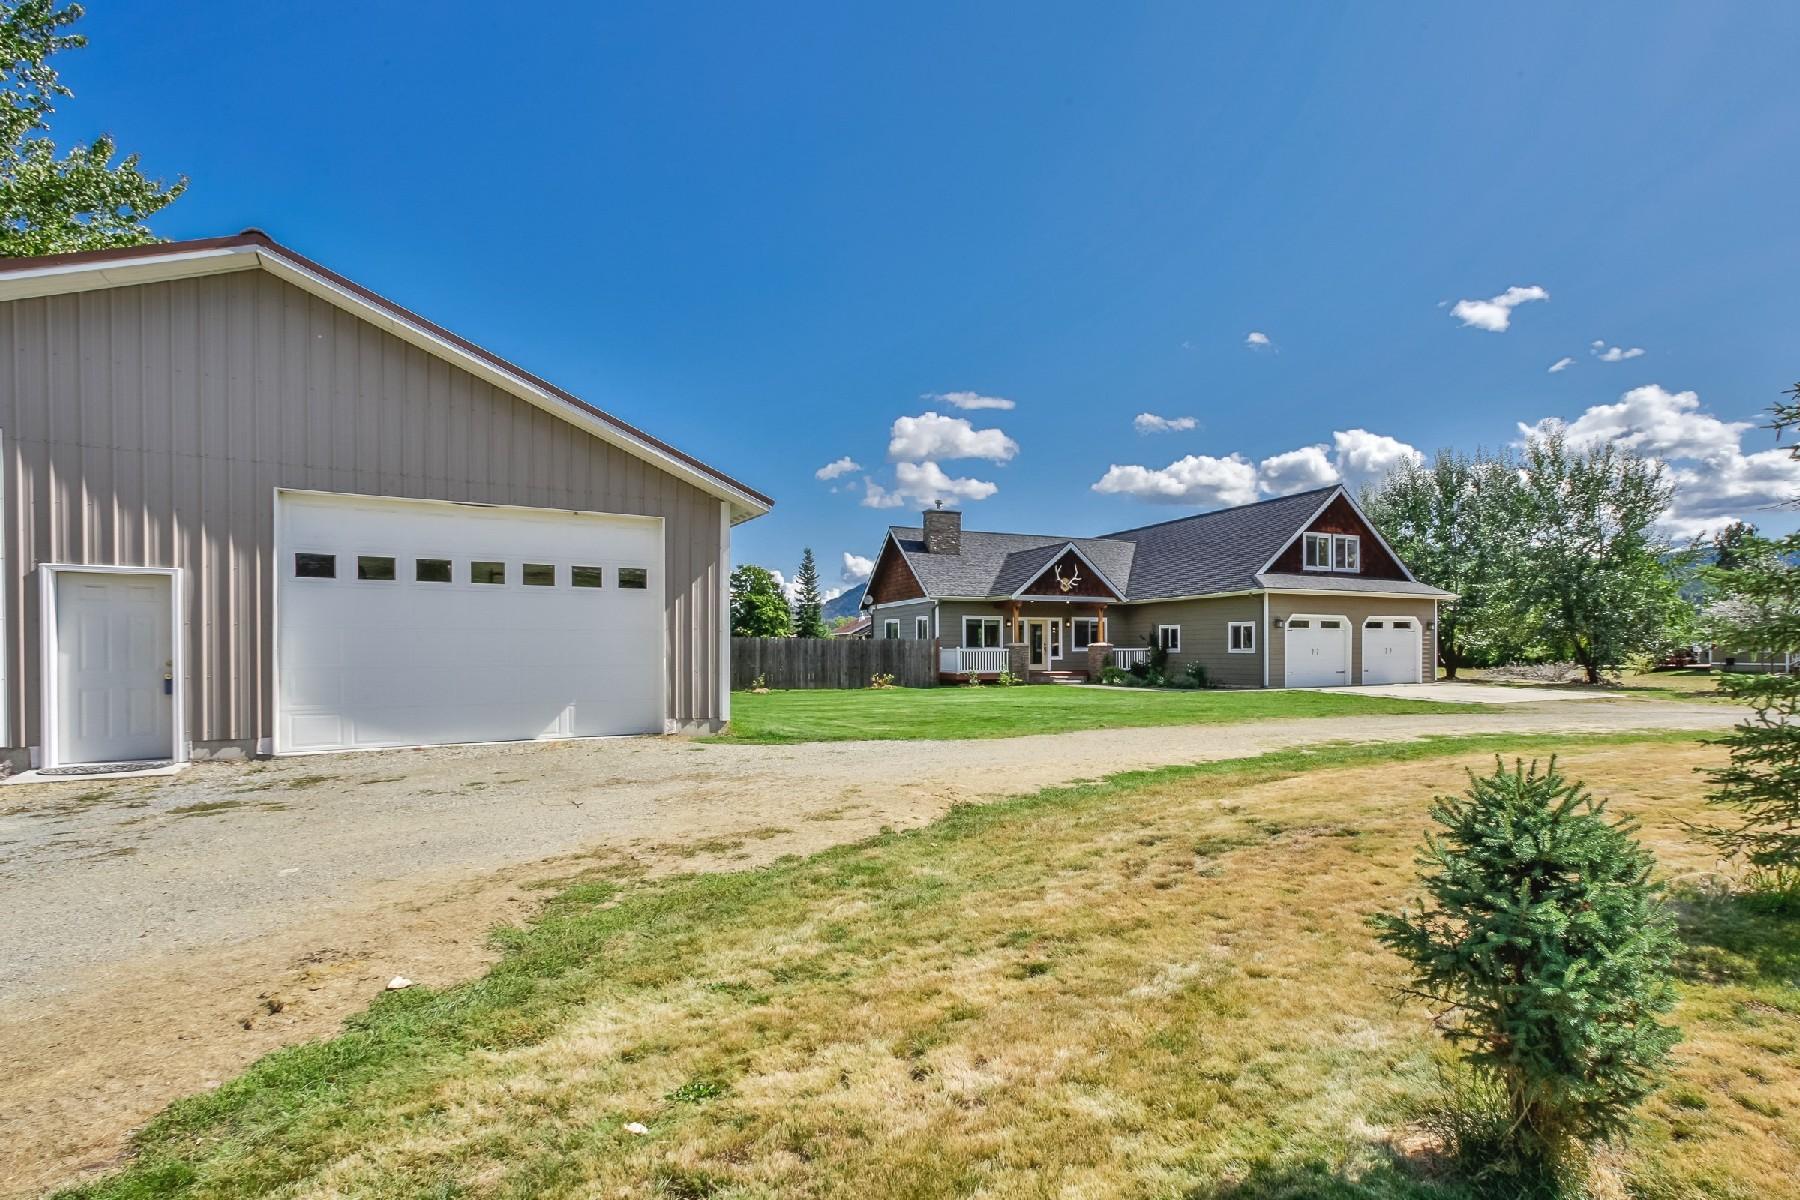 Single Family Homes のために 売買 アット Wonderful Design 307 Riley Creek, Laclede, アイダホ 83841 アメリカ